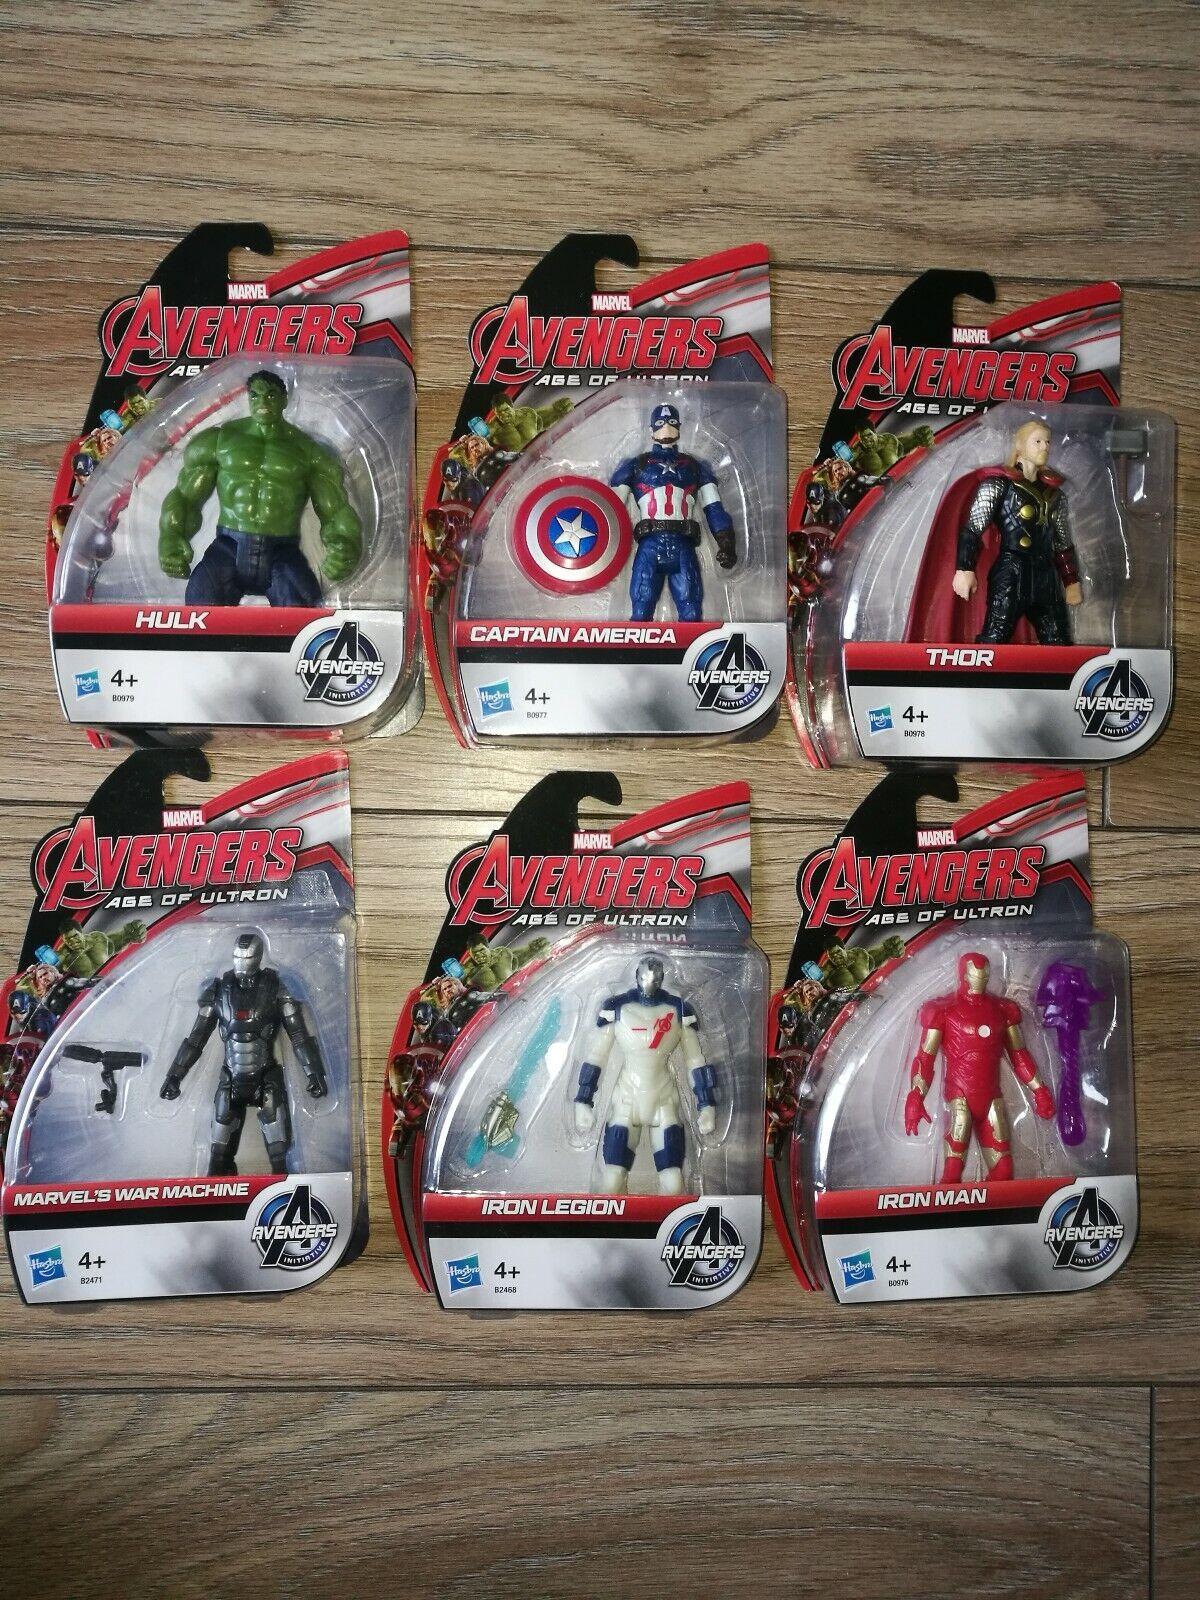 Avengers Captain America Hulk Iron menschen And More- Set 6 Figures